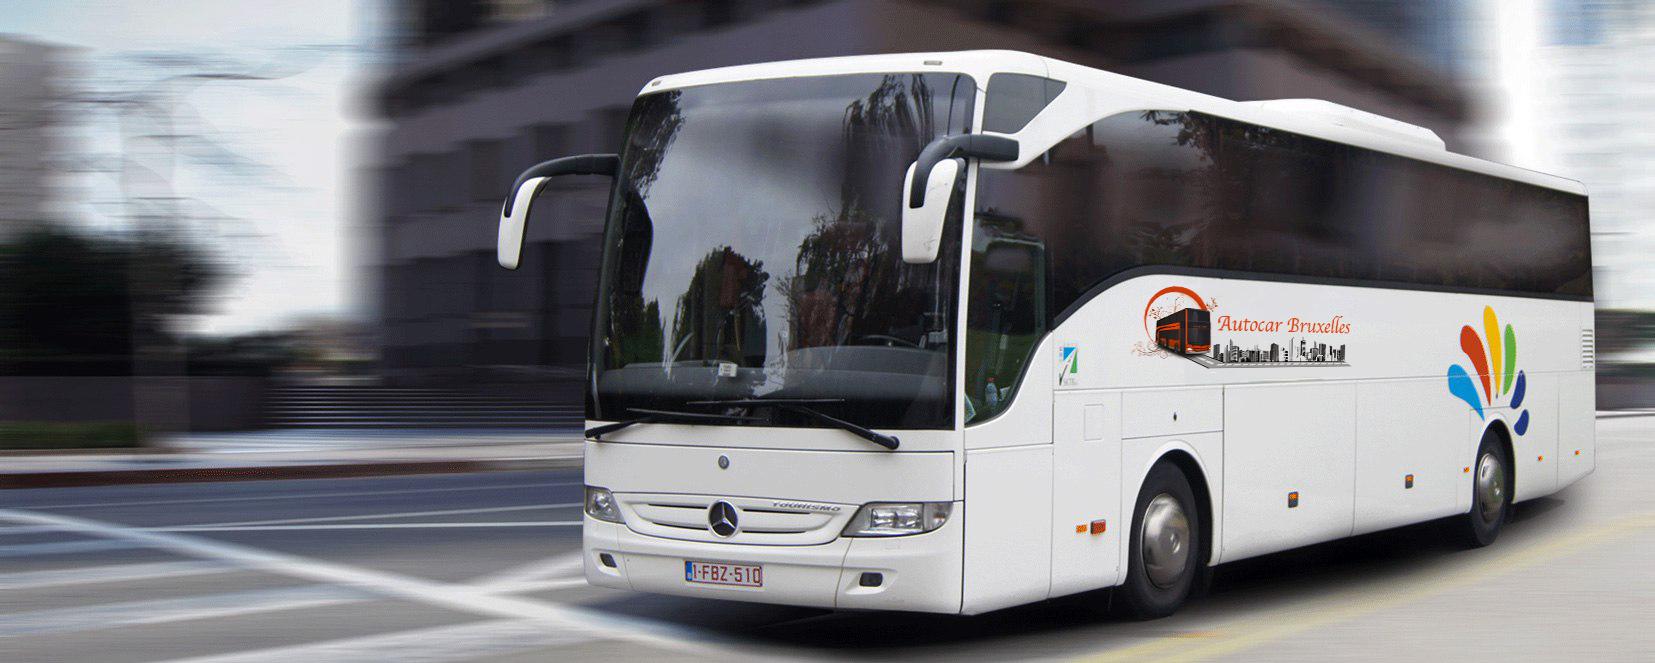 Autocar-bruxelles-slide1.jpg